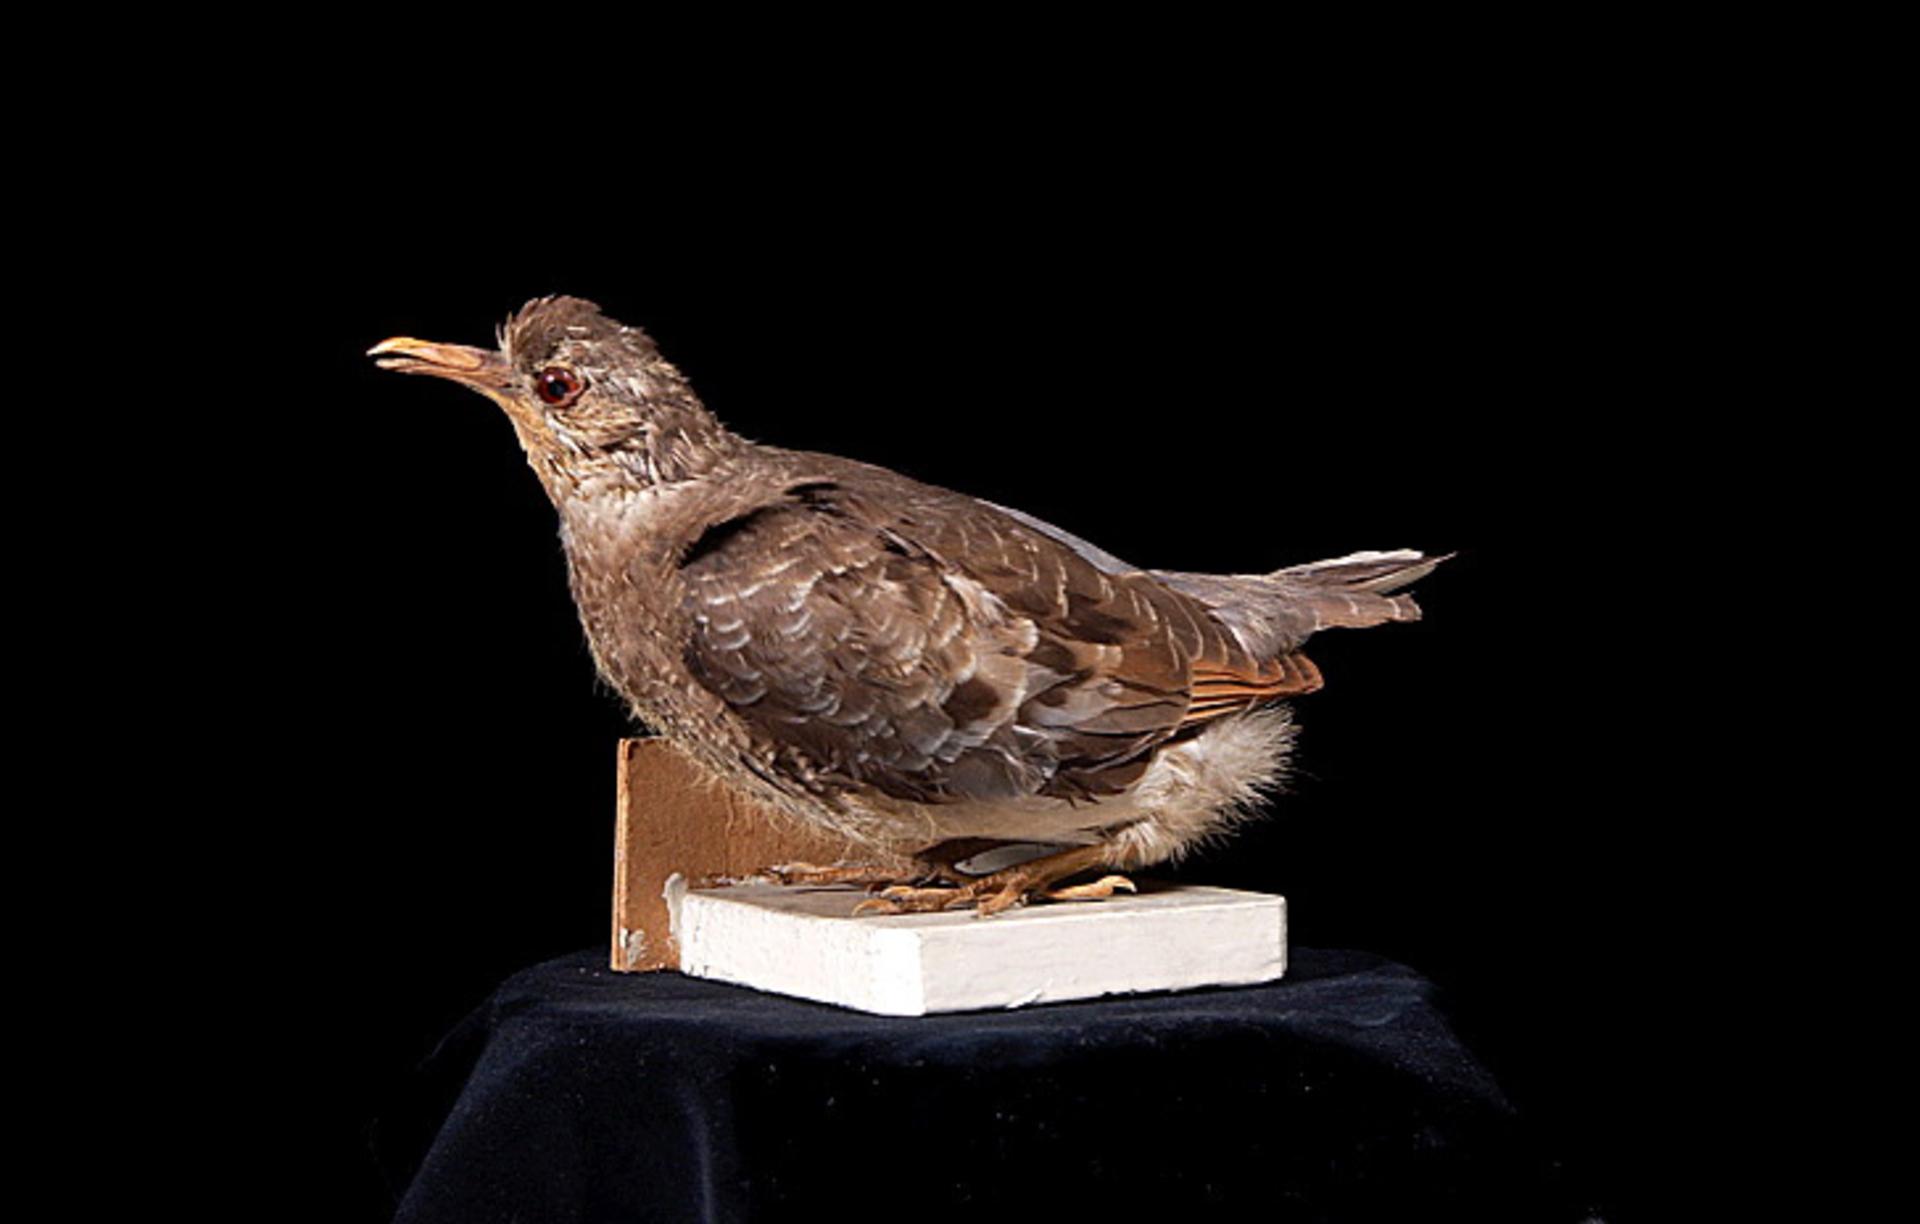 RMNH.AVES.110088 | Ectopistes migratorius Linnaeus, 1766